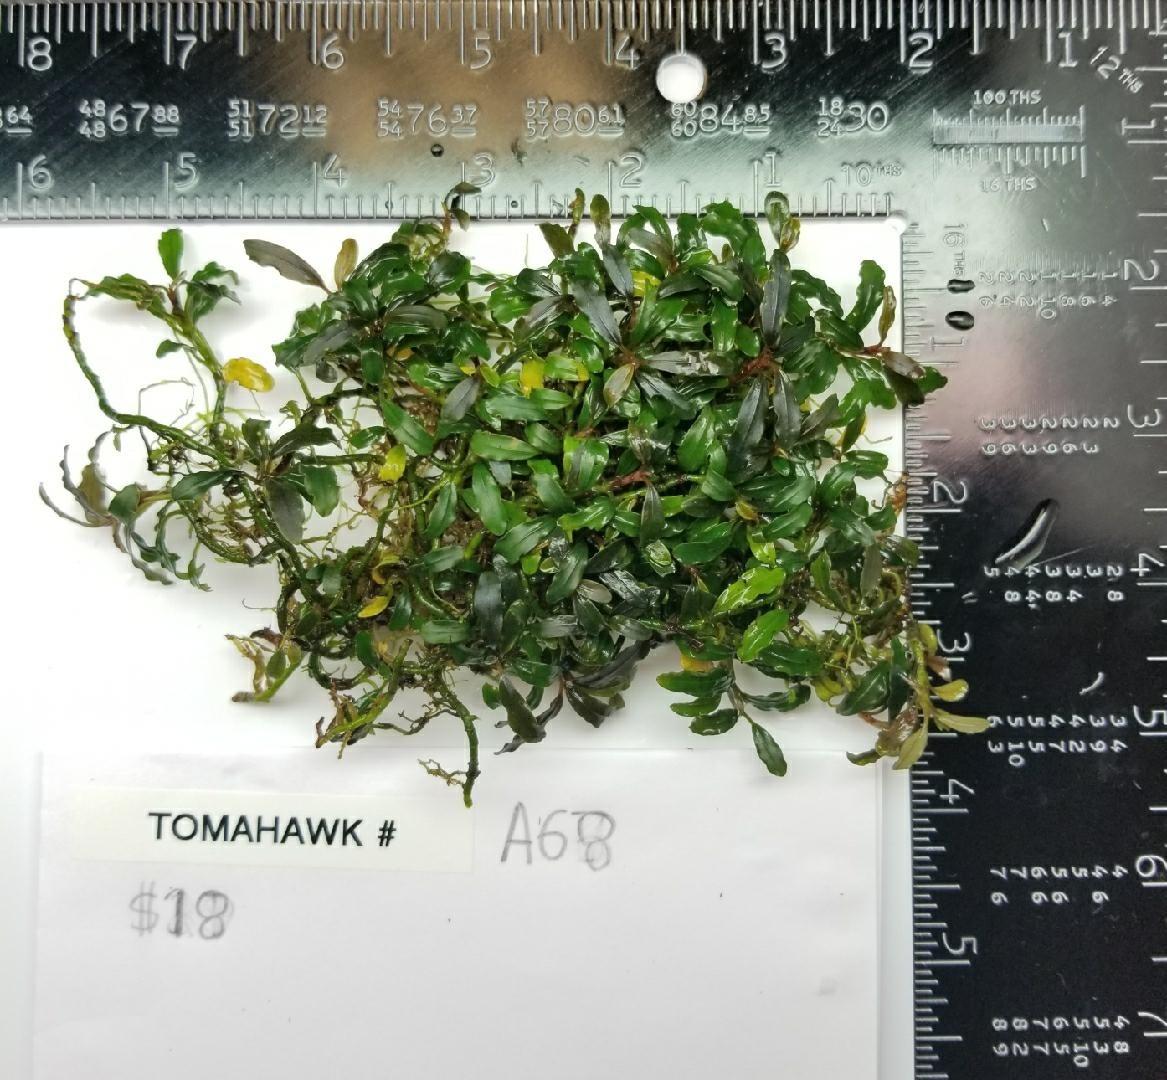 Tomahawk Buce - A68